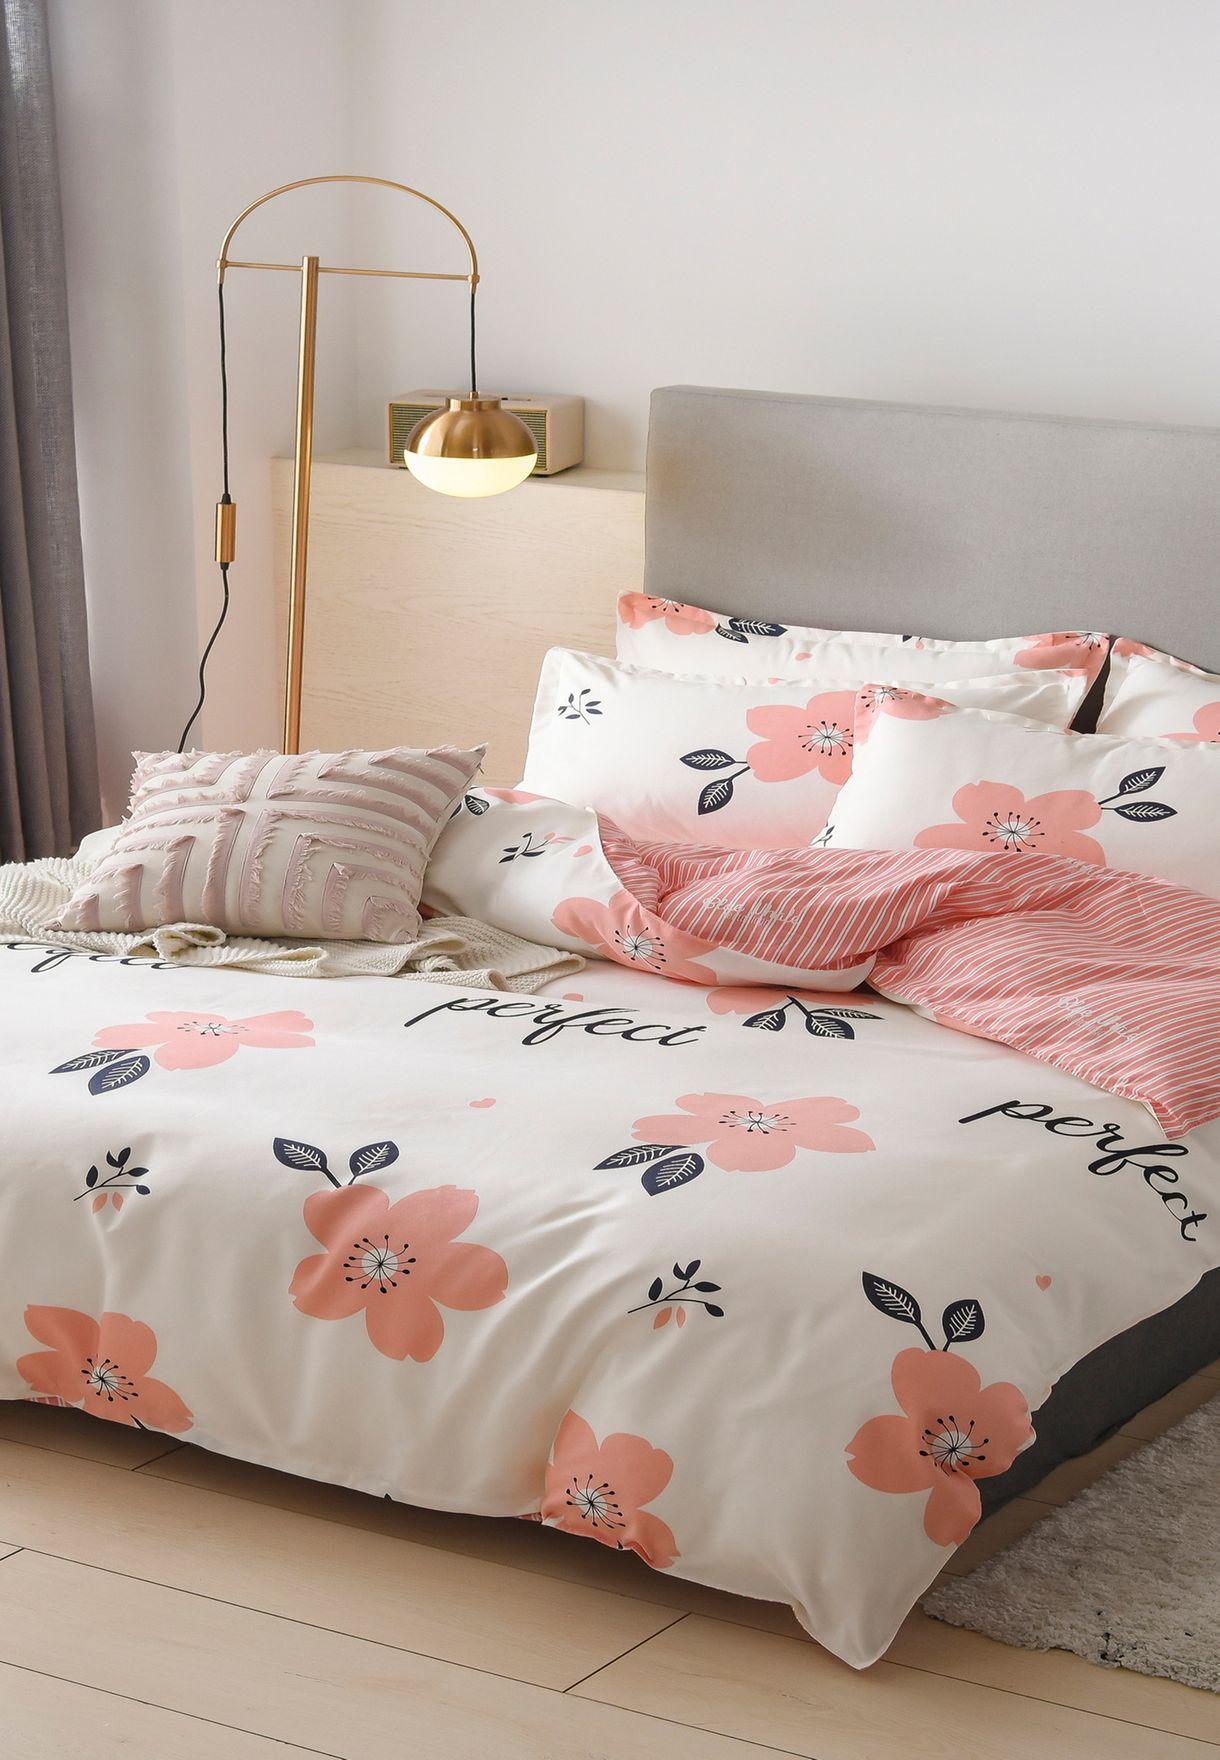 4 Piece King Printed Bedding Set 200 X 230Cm